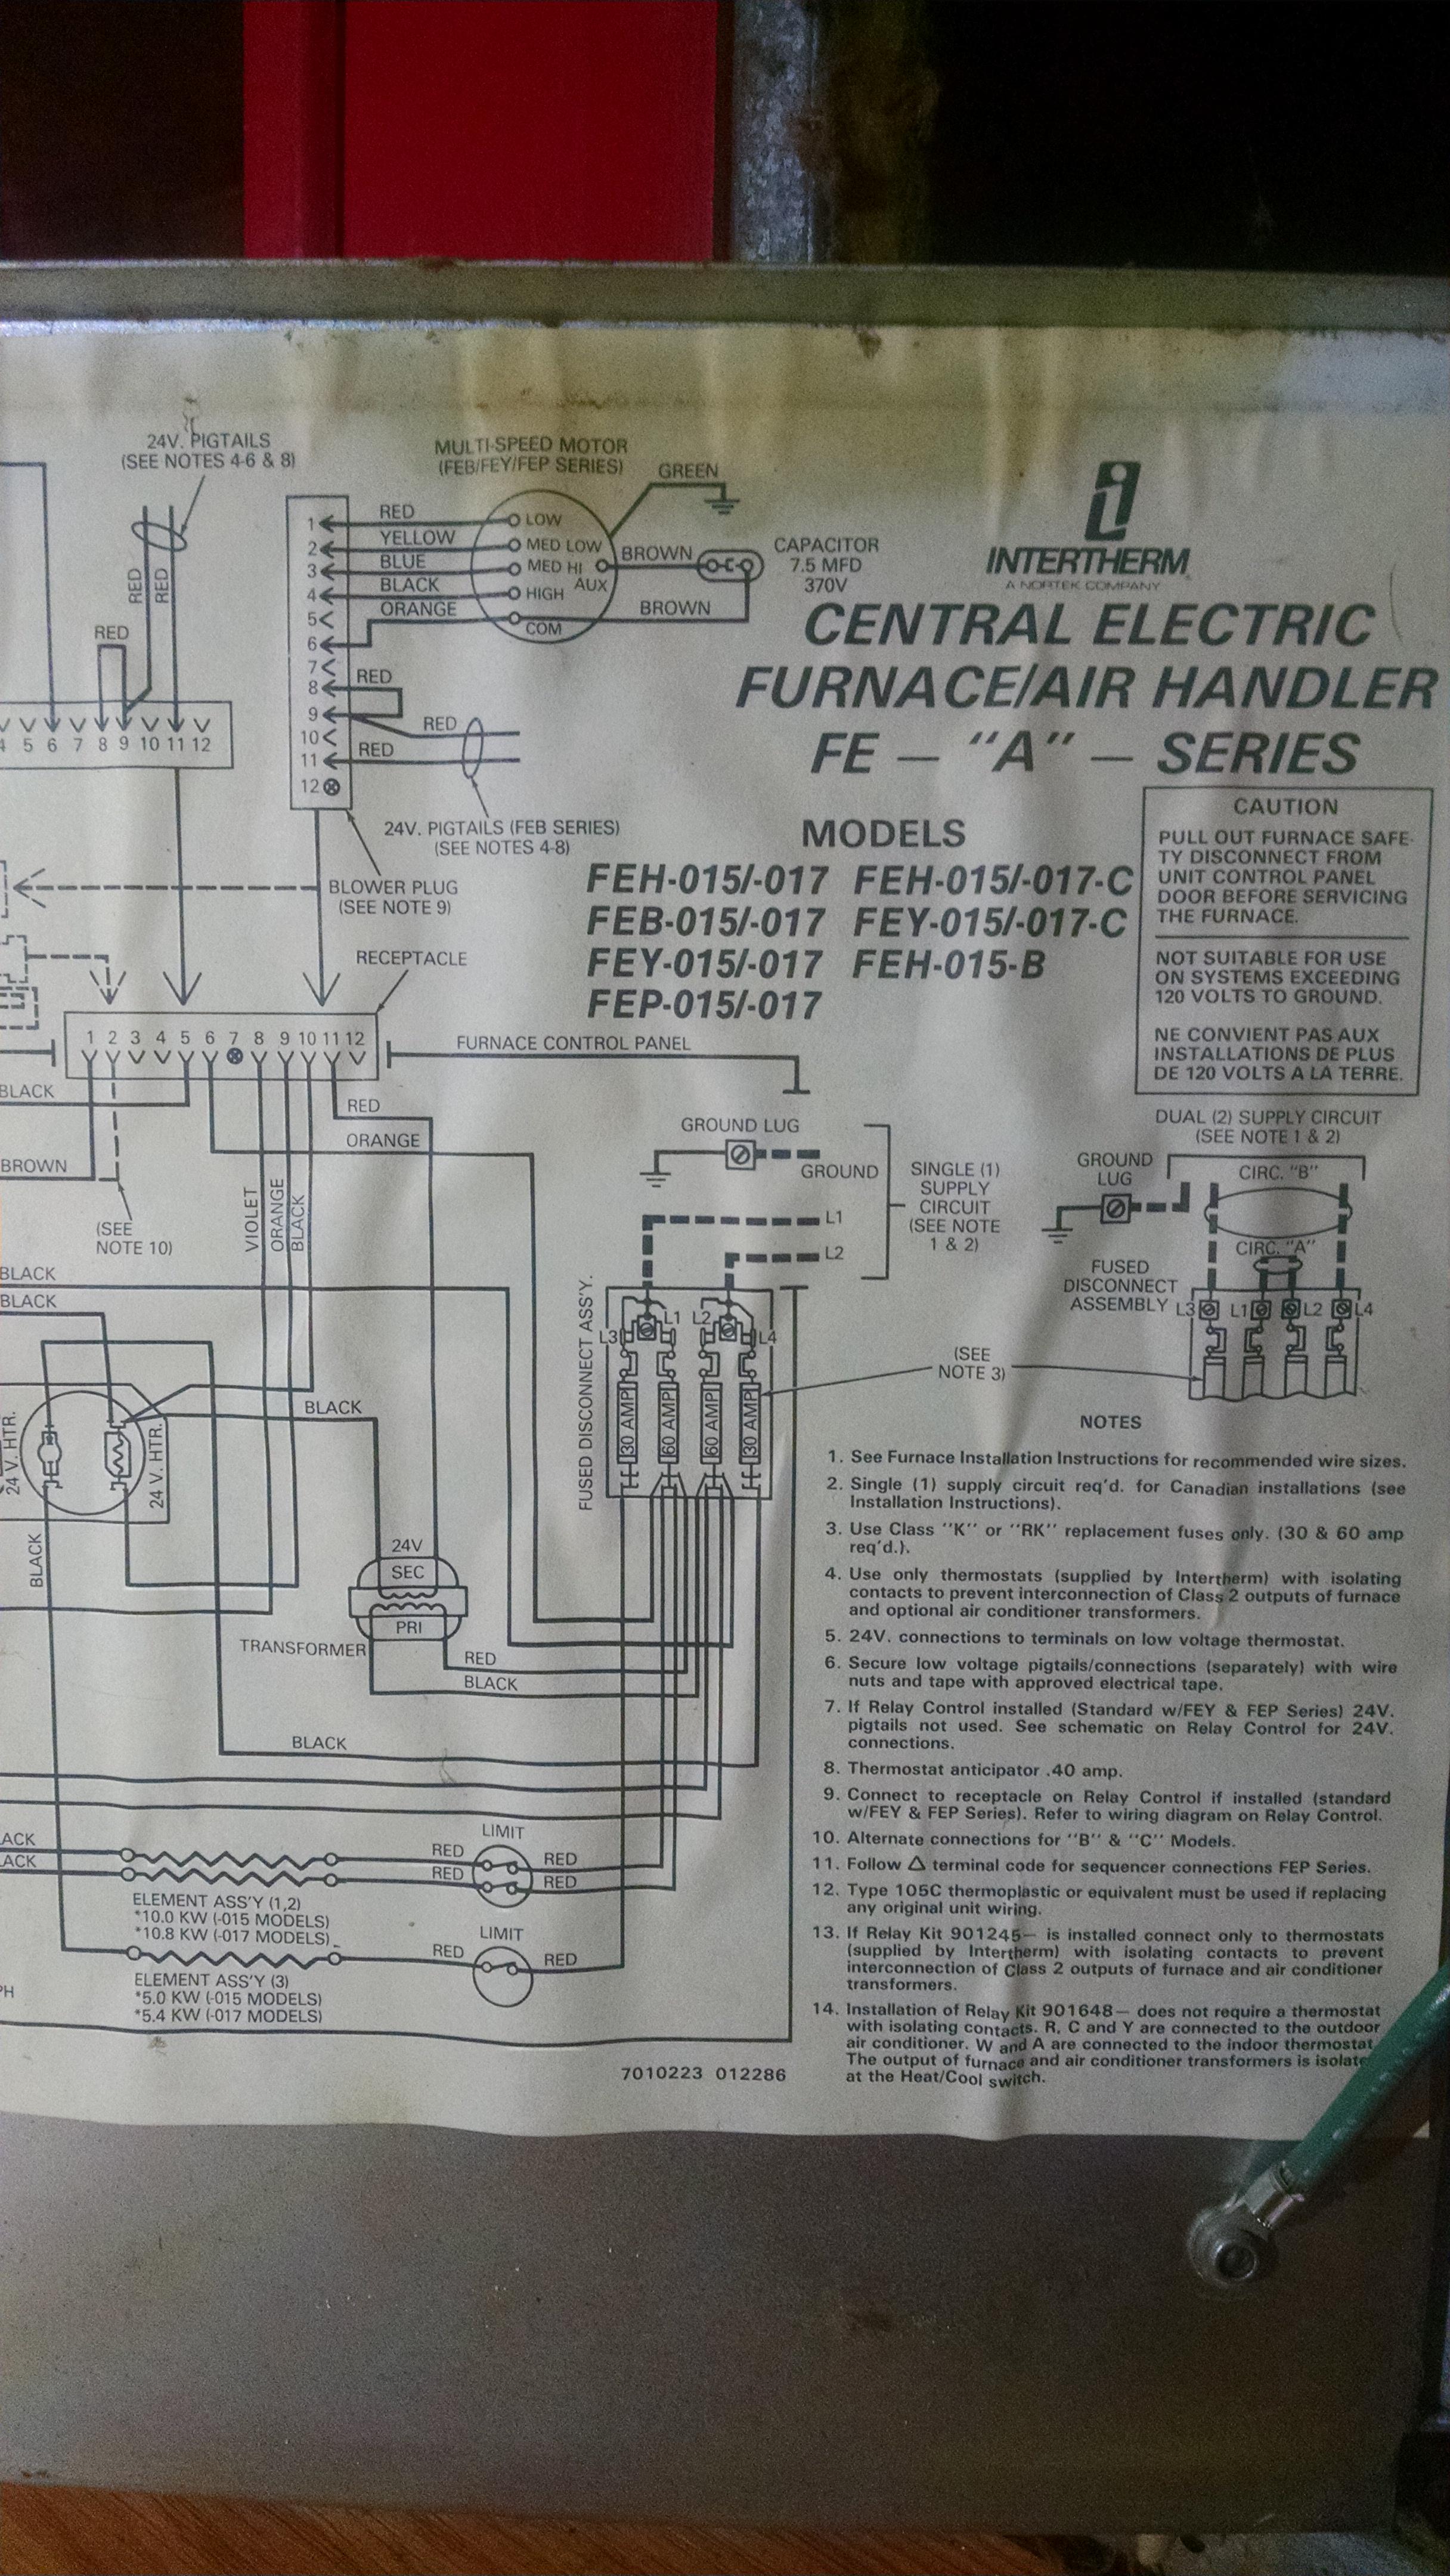 I Have A Intertherm Ultraflex Model Nub  Feh